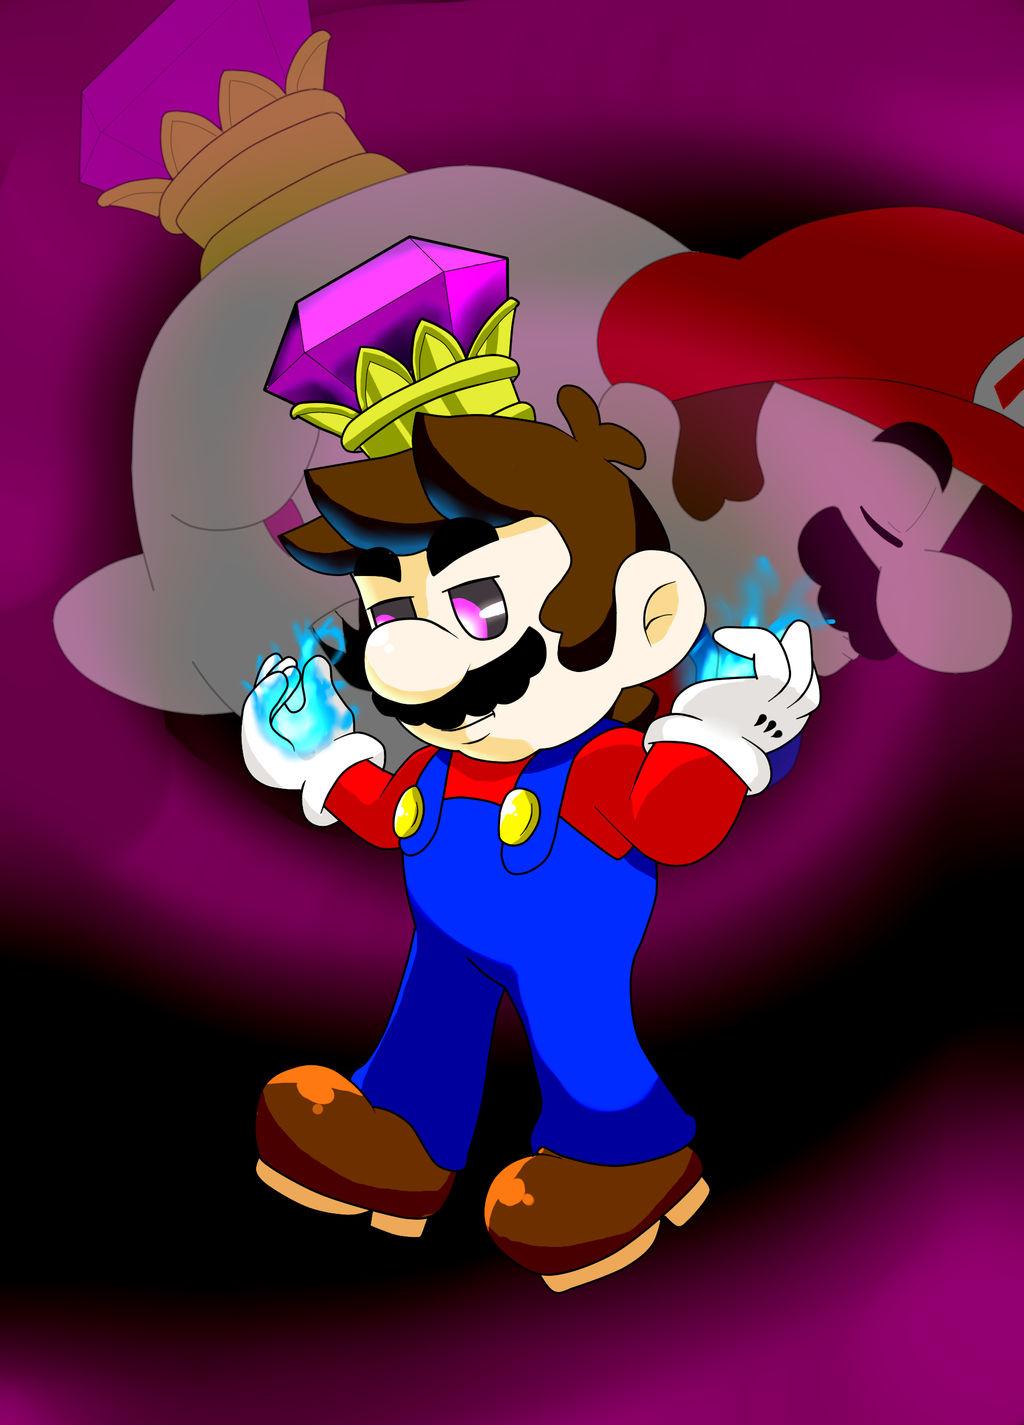 Mario Possessed By King Boo By Geekythemariotaku On Deviantart